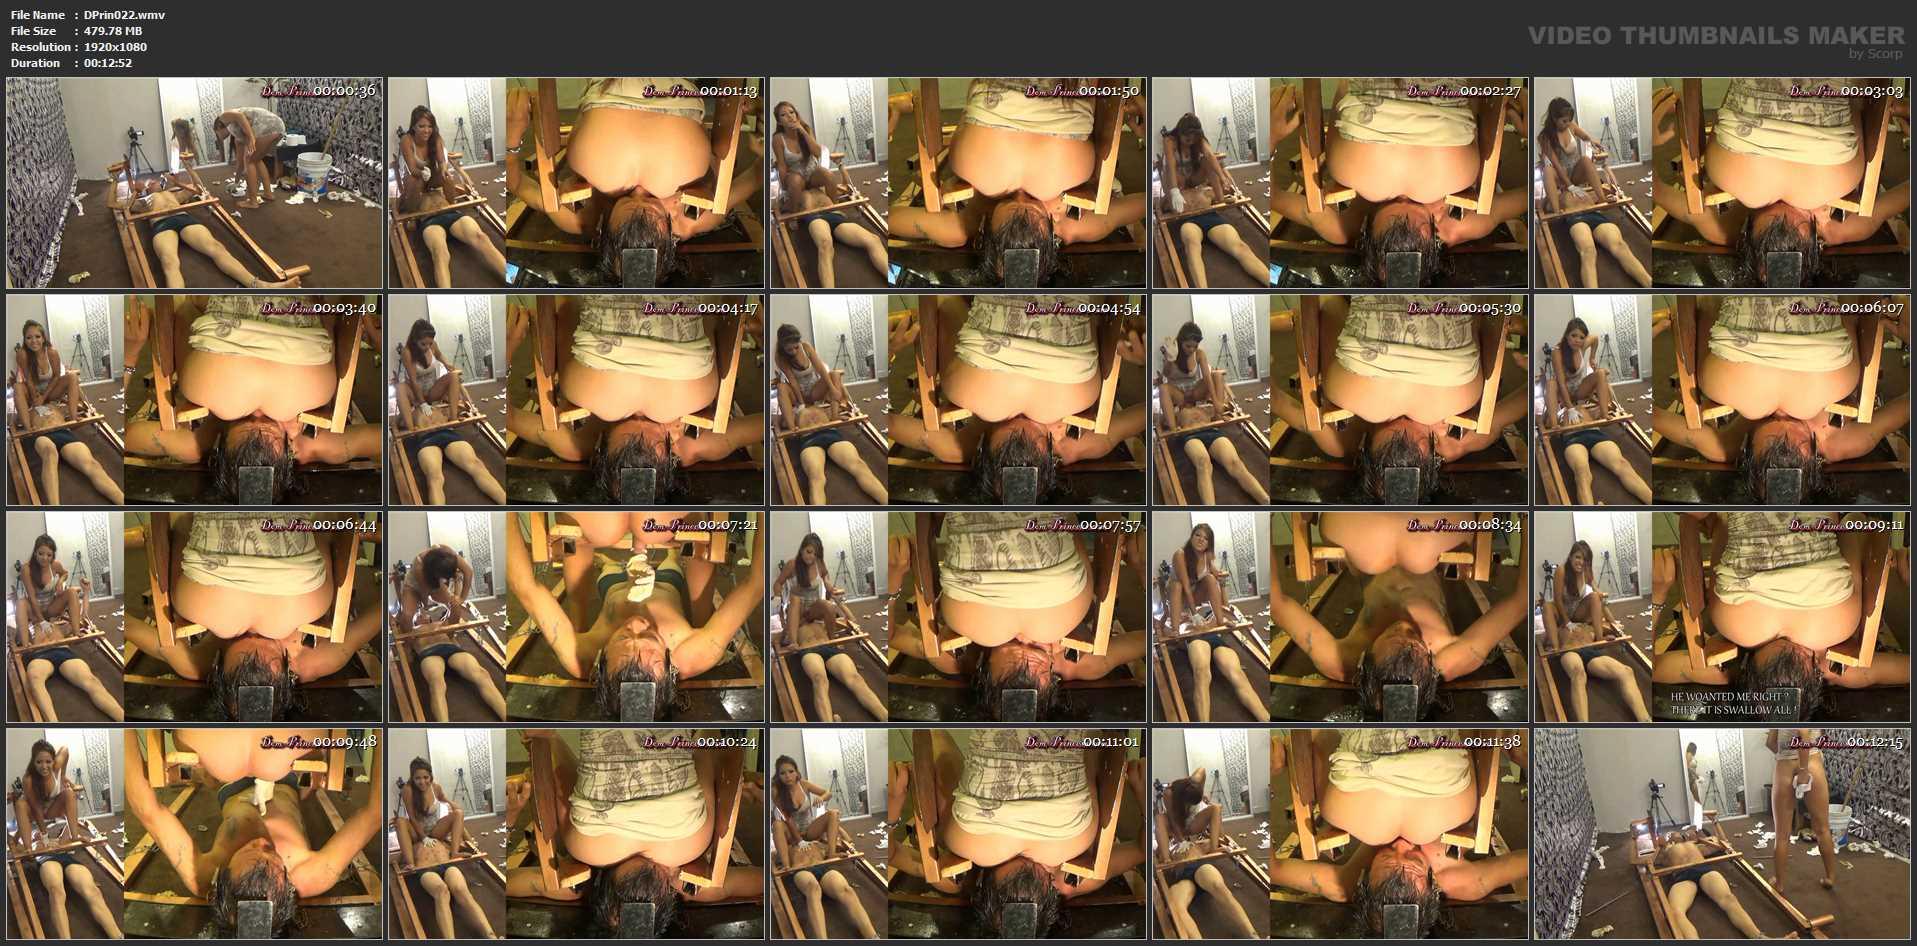 [DOM-PRINCESS] The Girl Lifter Part 5 Karina [FULL HD][1080p][WMV]